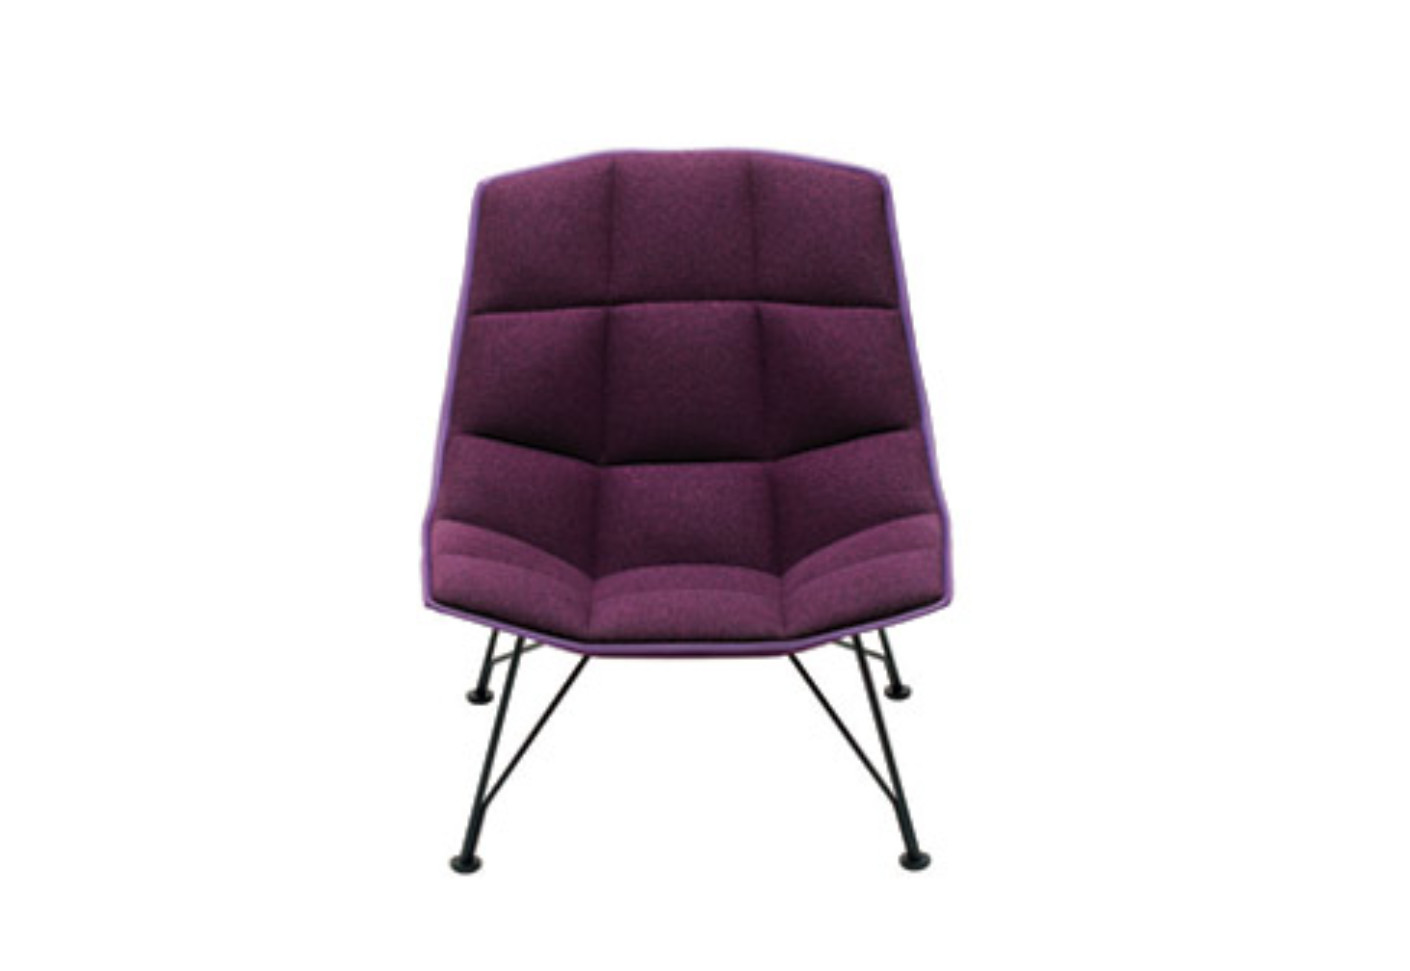 jl loungesessel von knoll stylepark. Black Bedroom Furniture Sets. Home Design Ideas